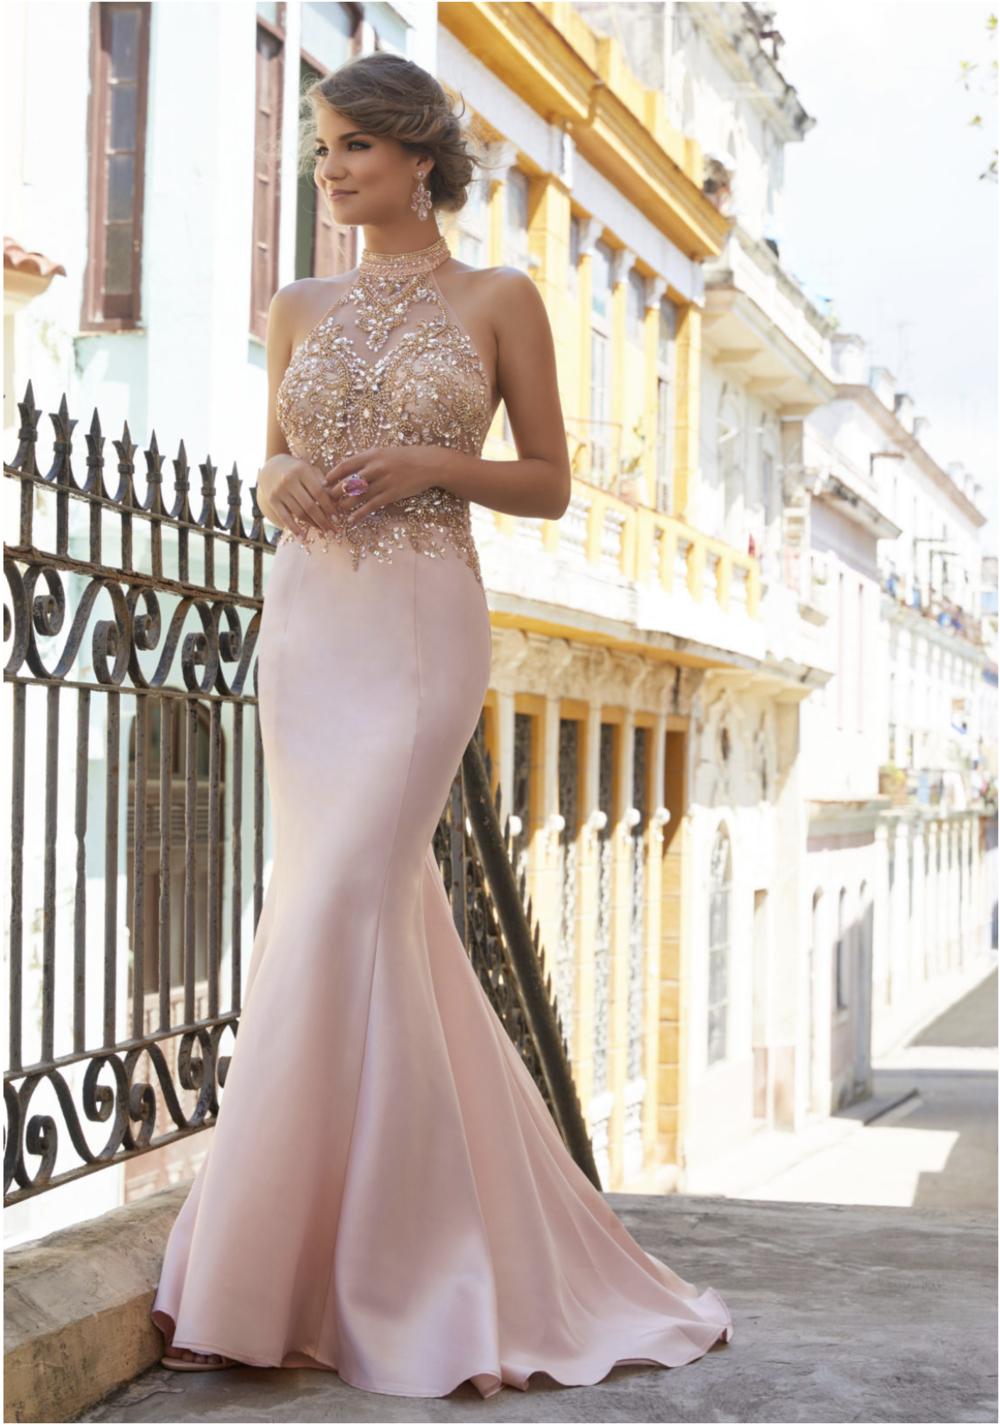 093a03787197 Mori Lee Prom at Irma's Bridal